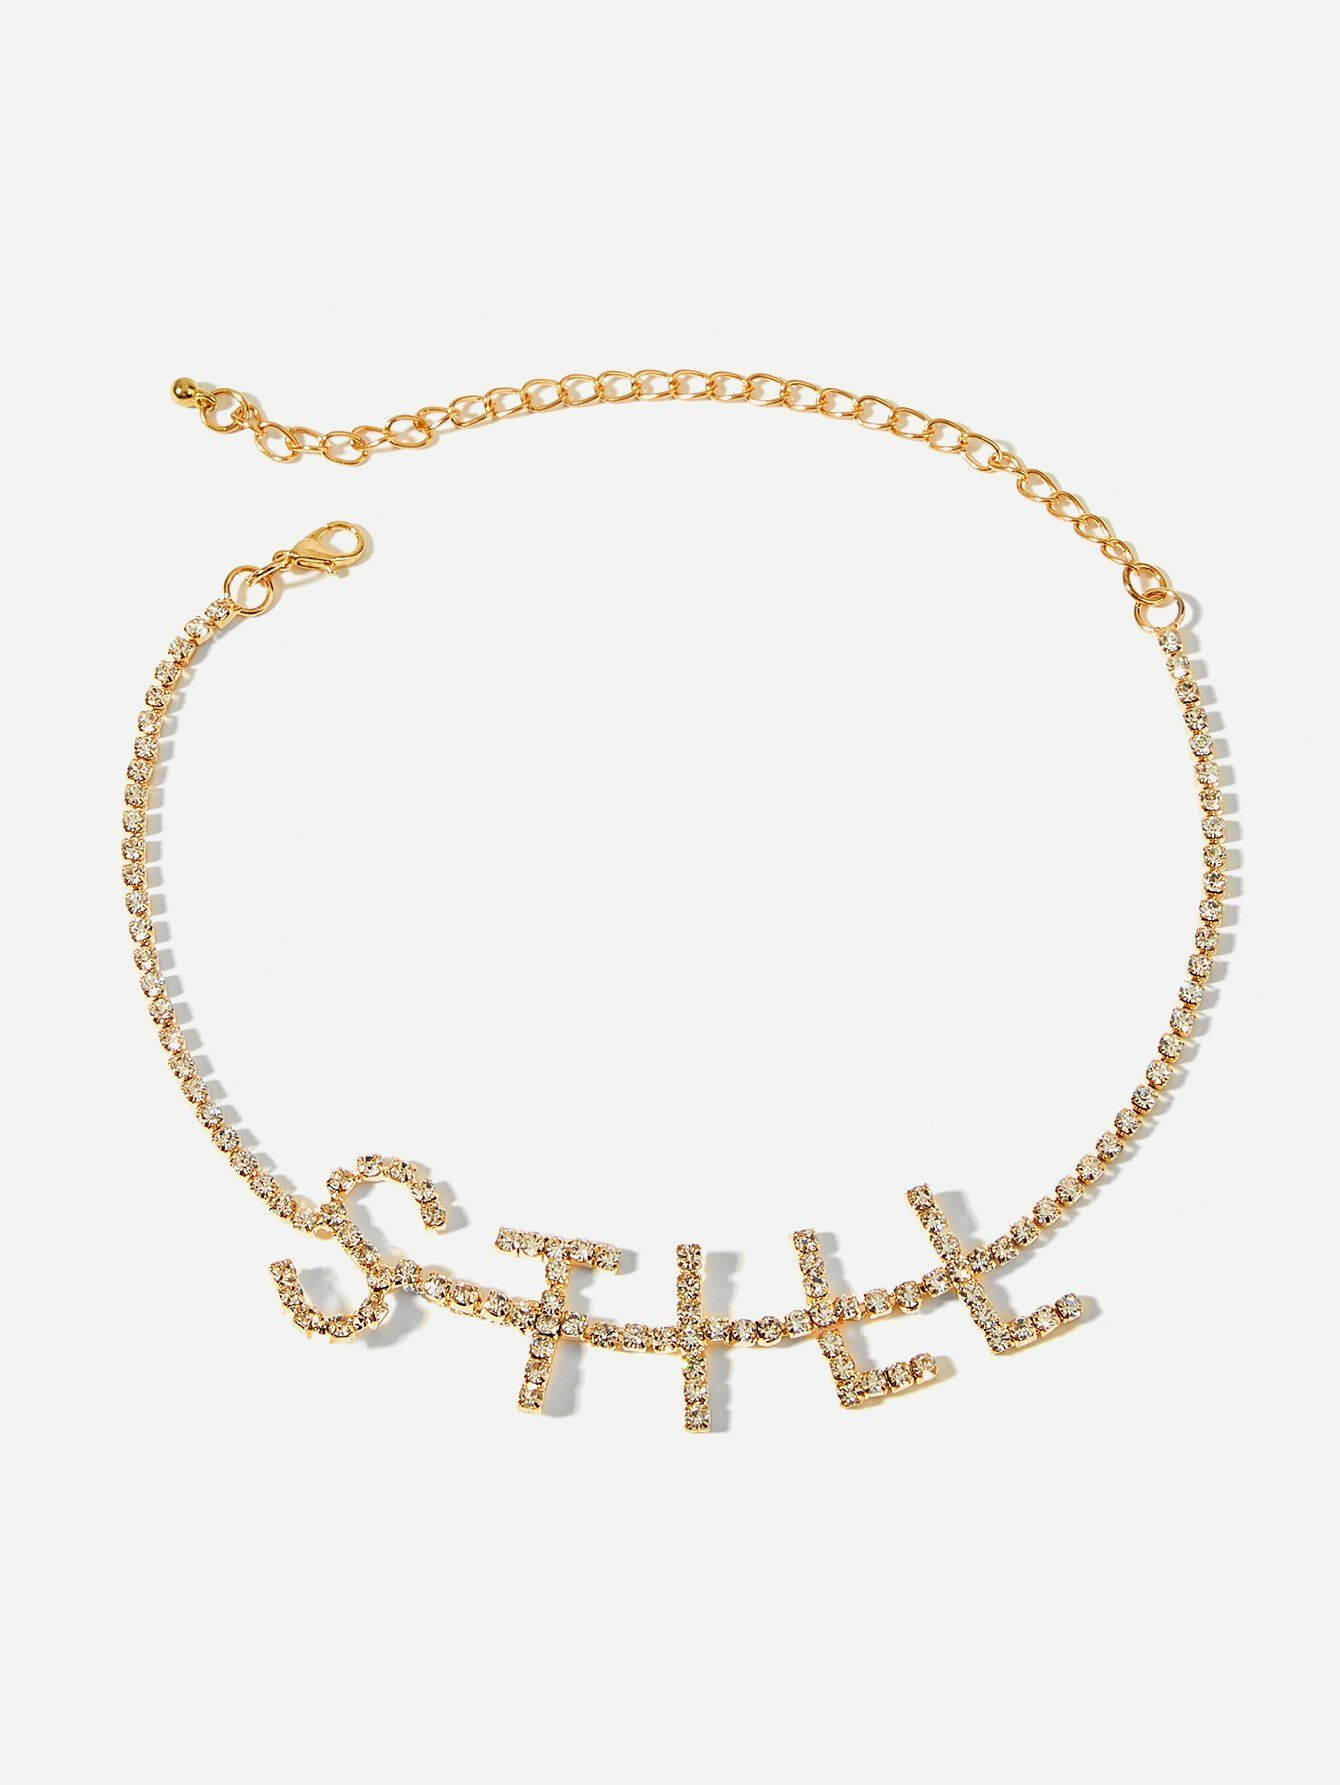 528e20fb79b Rhinestone Letter Decorated Choker . . . . . .  diamond  gold  cartier   silver  style  vca  fashionista  jewelry  necklace  diamonds  accessories   wedding ...